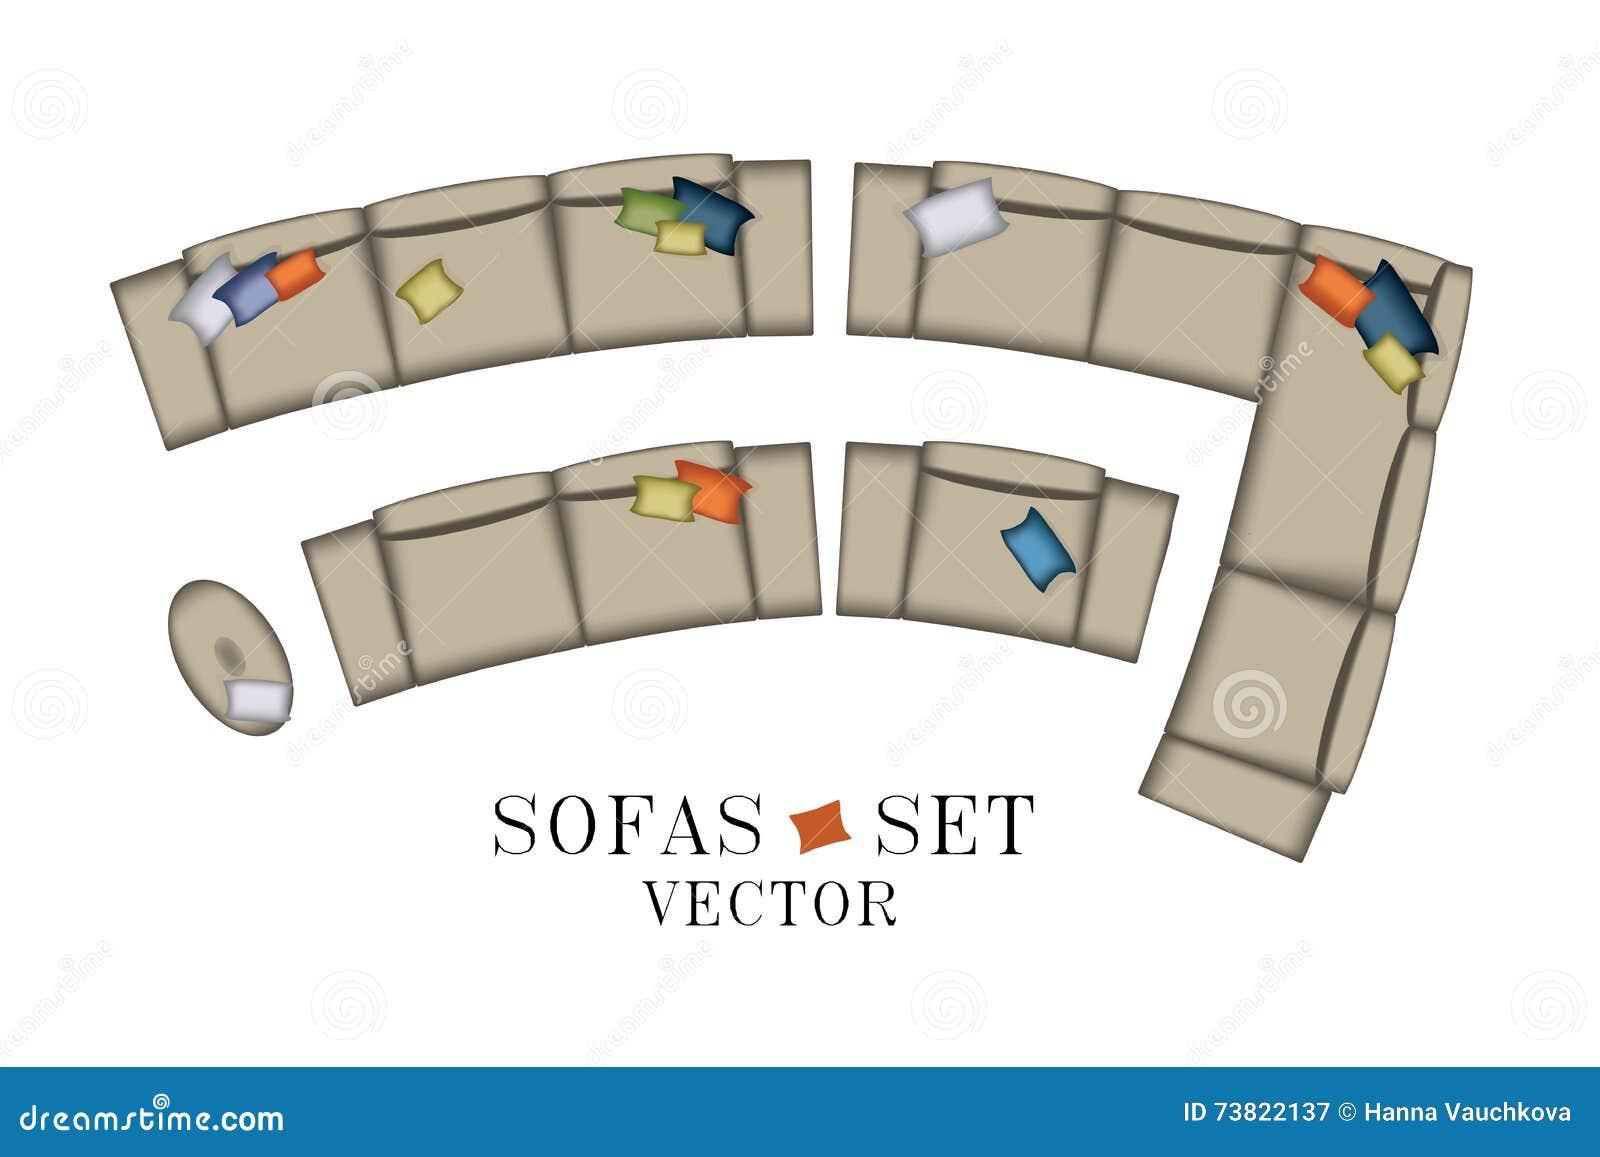 Creative Furniture Icons Set Flat Design Download Set Of Furniture